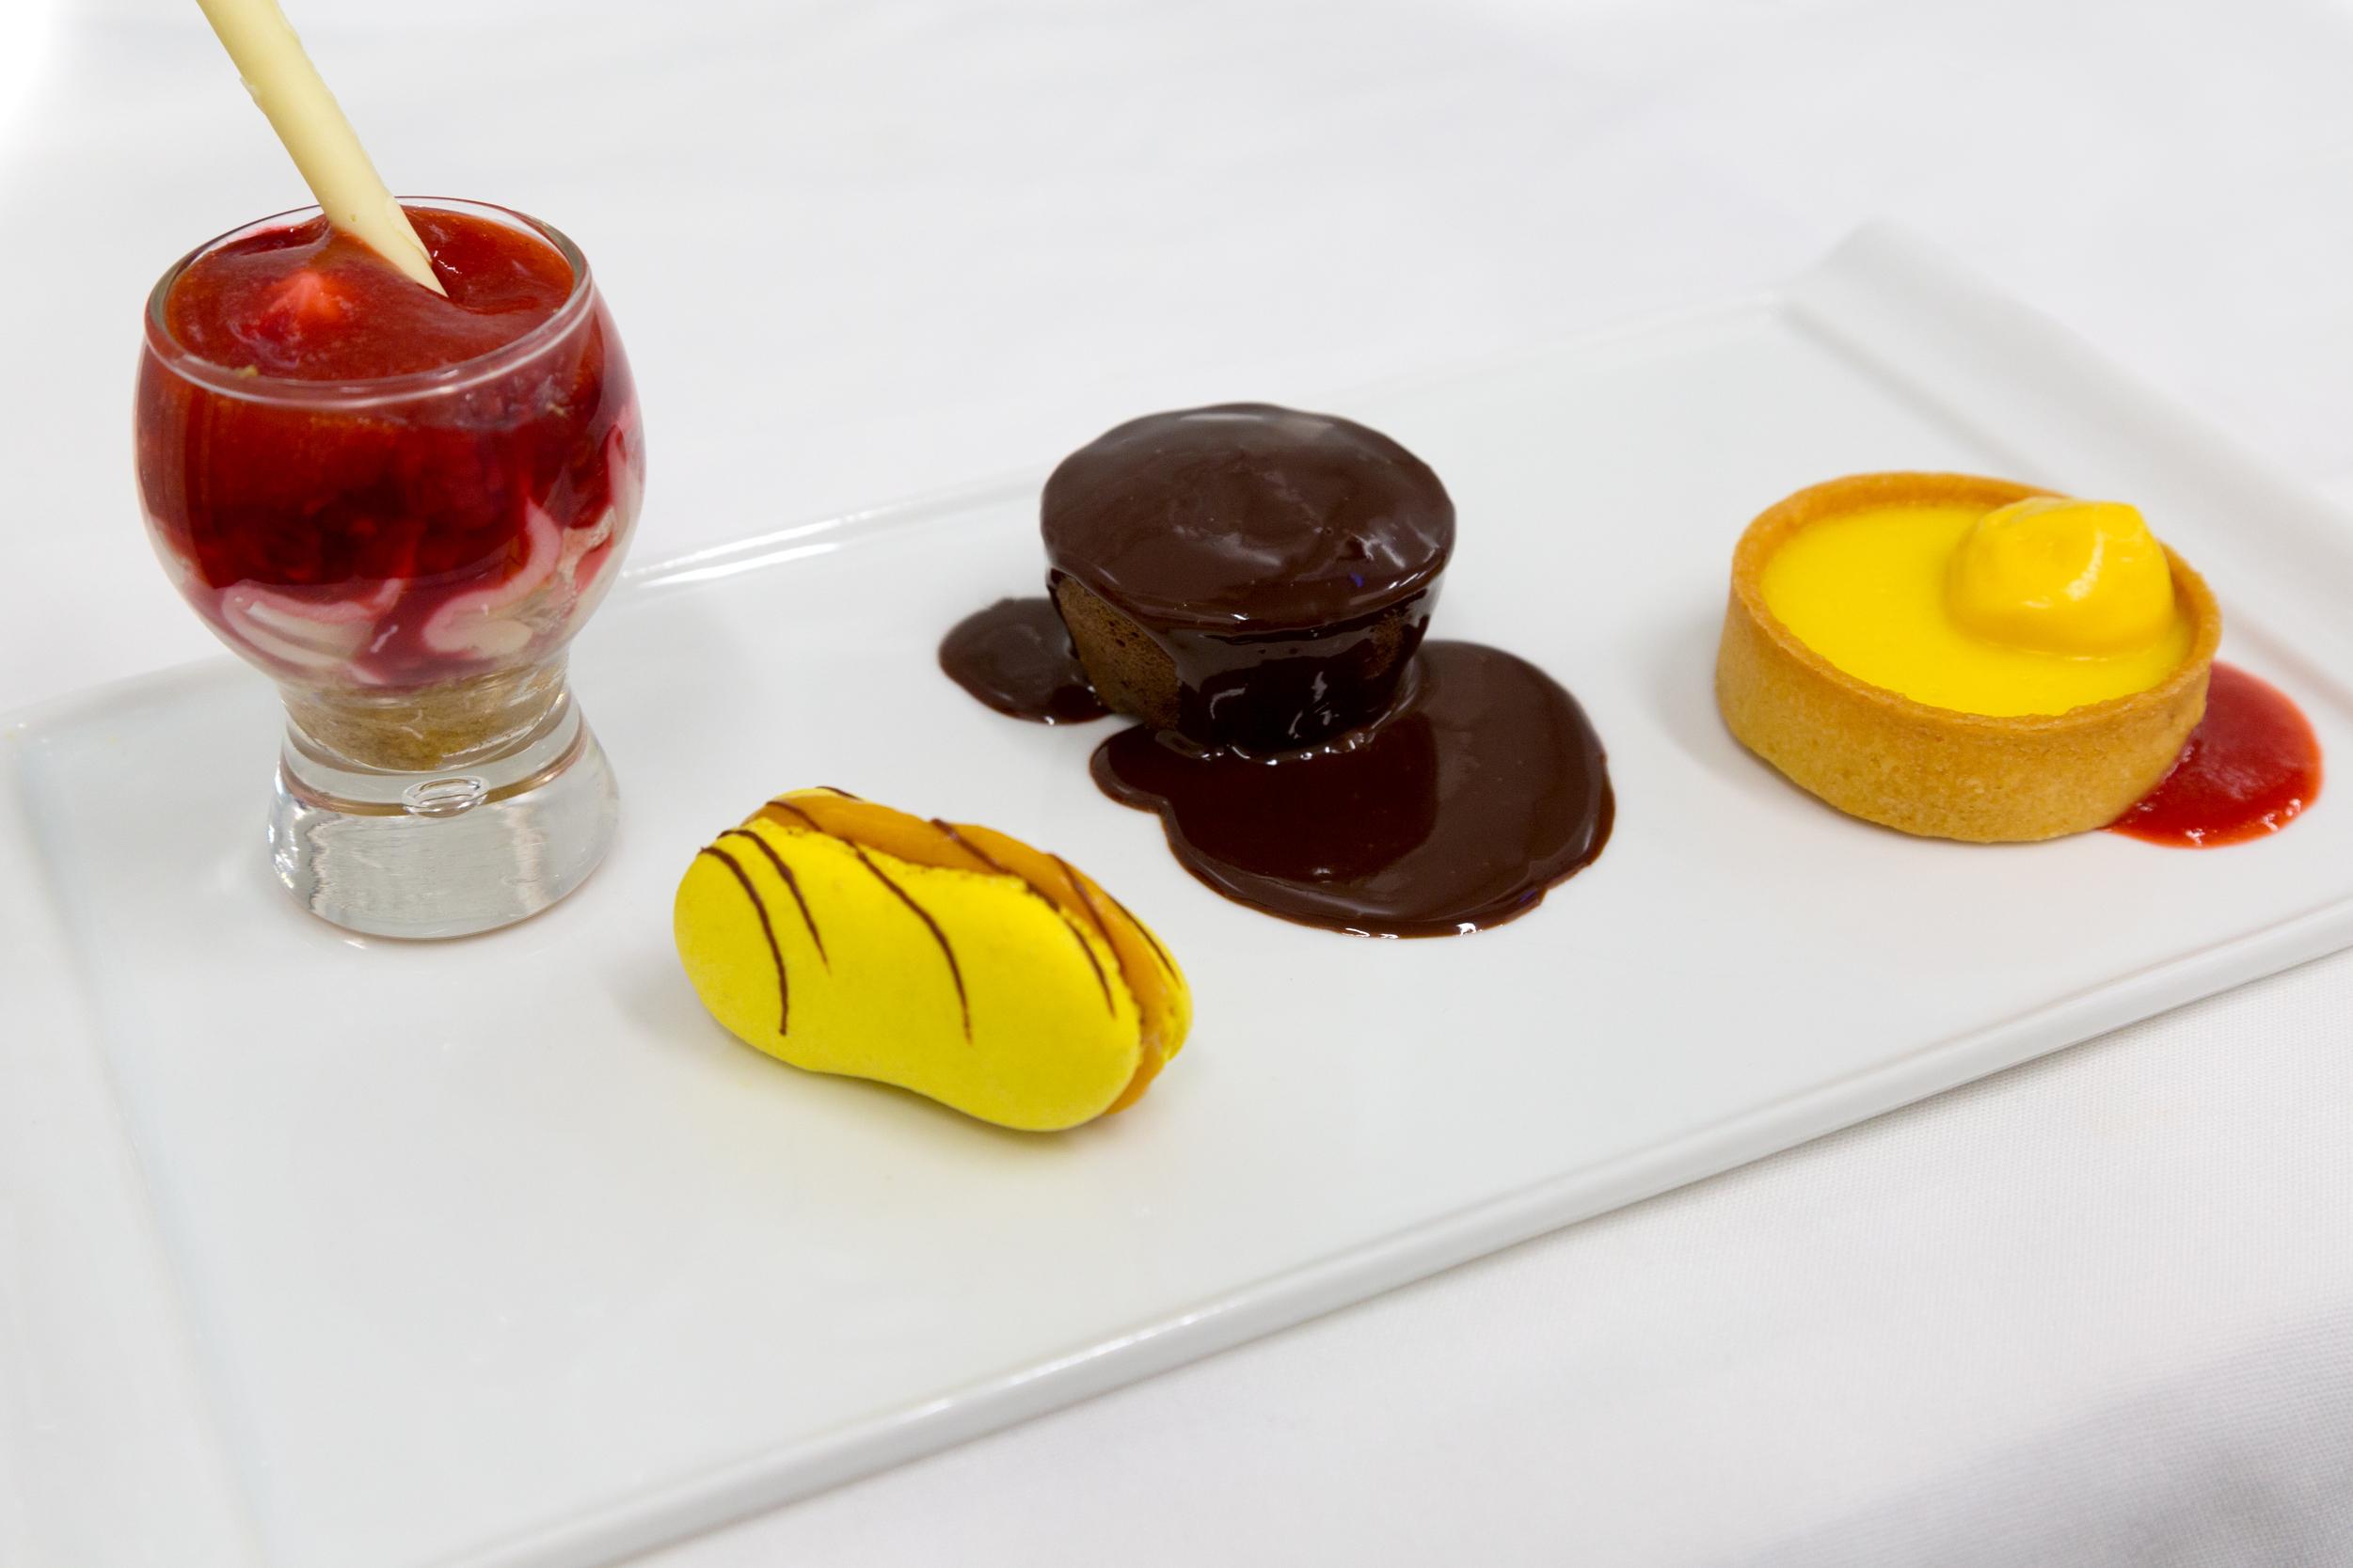 Tasting Session Dessert